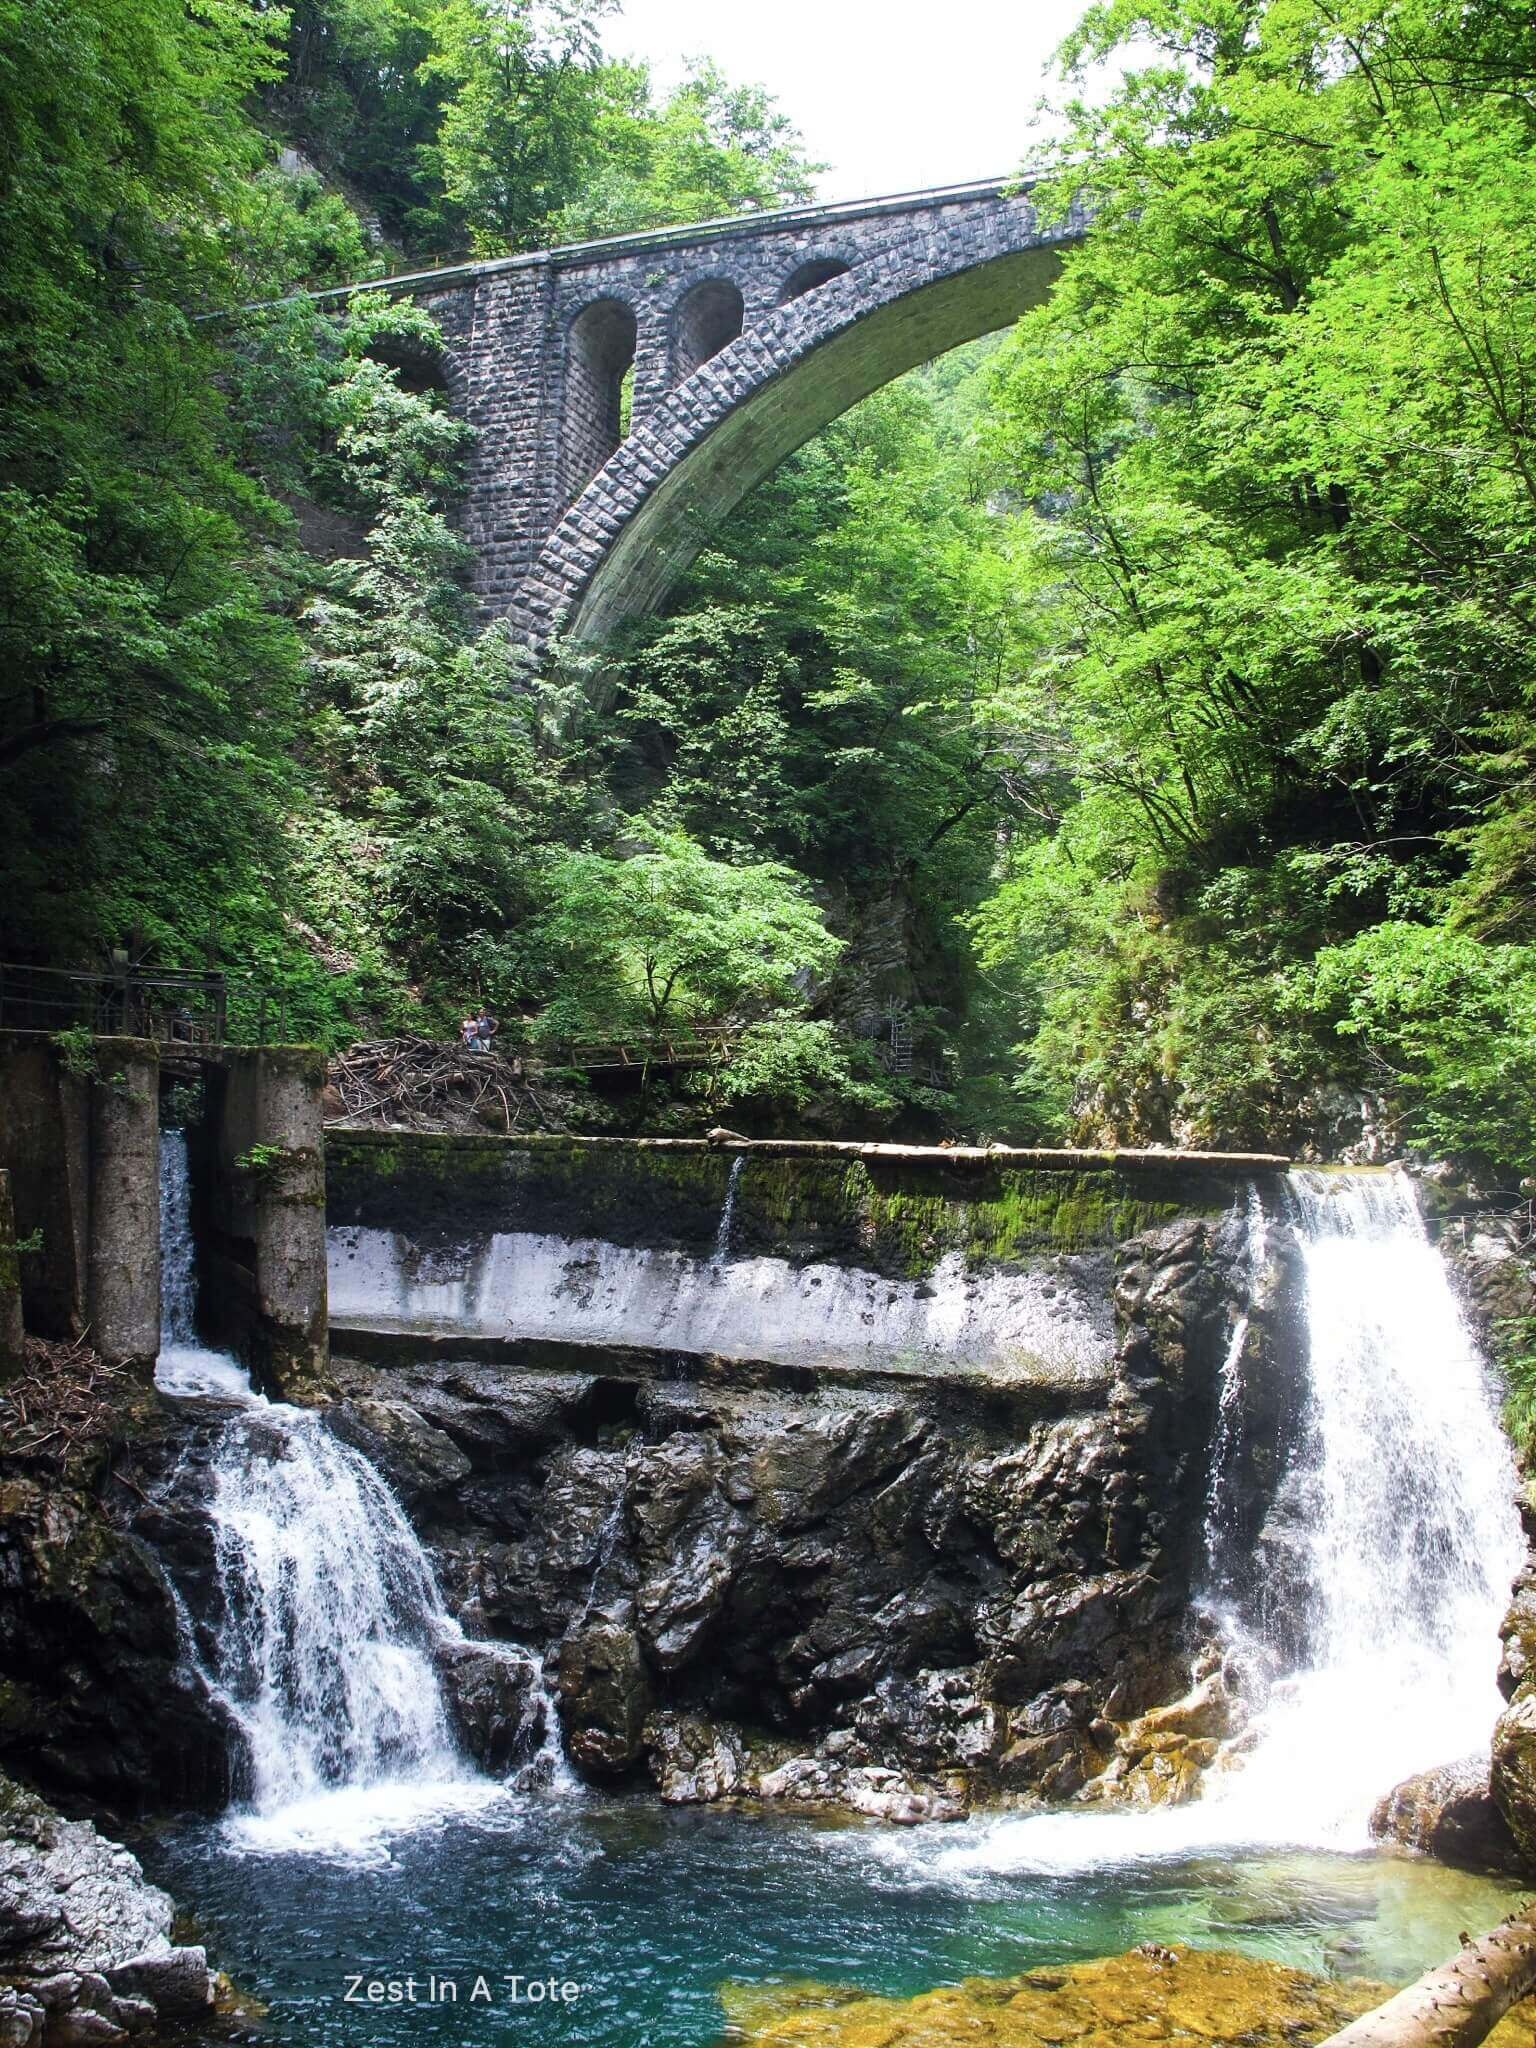 Stone bridge and the dam at Vintgar Gorge